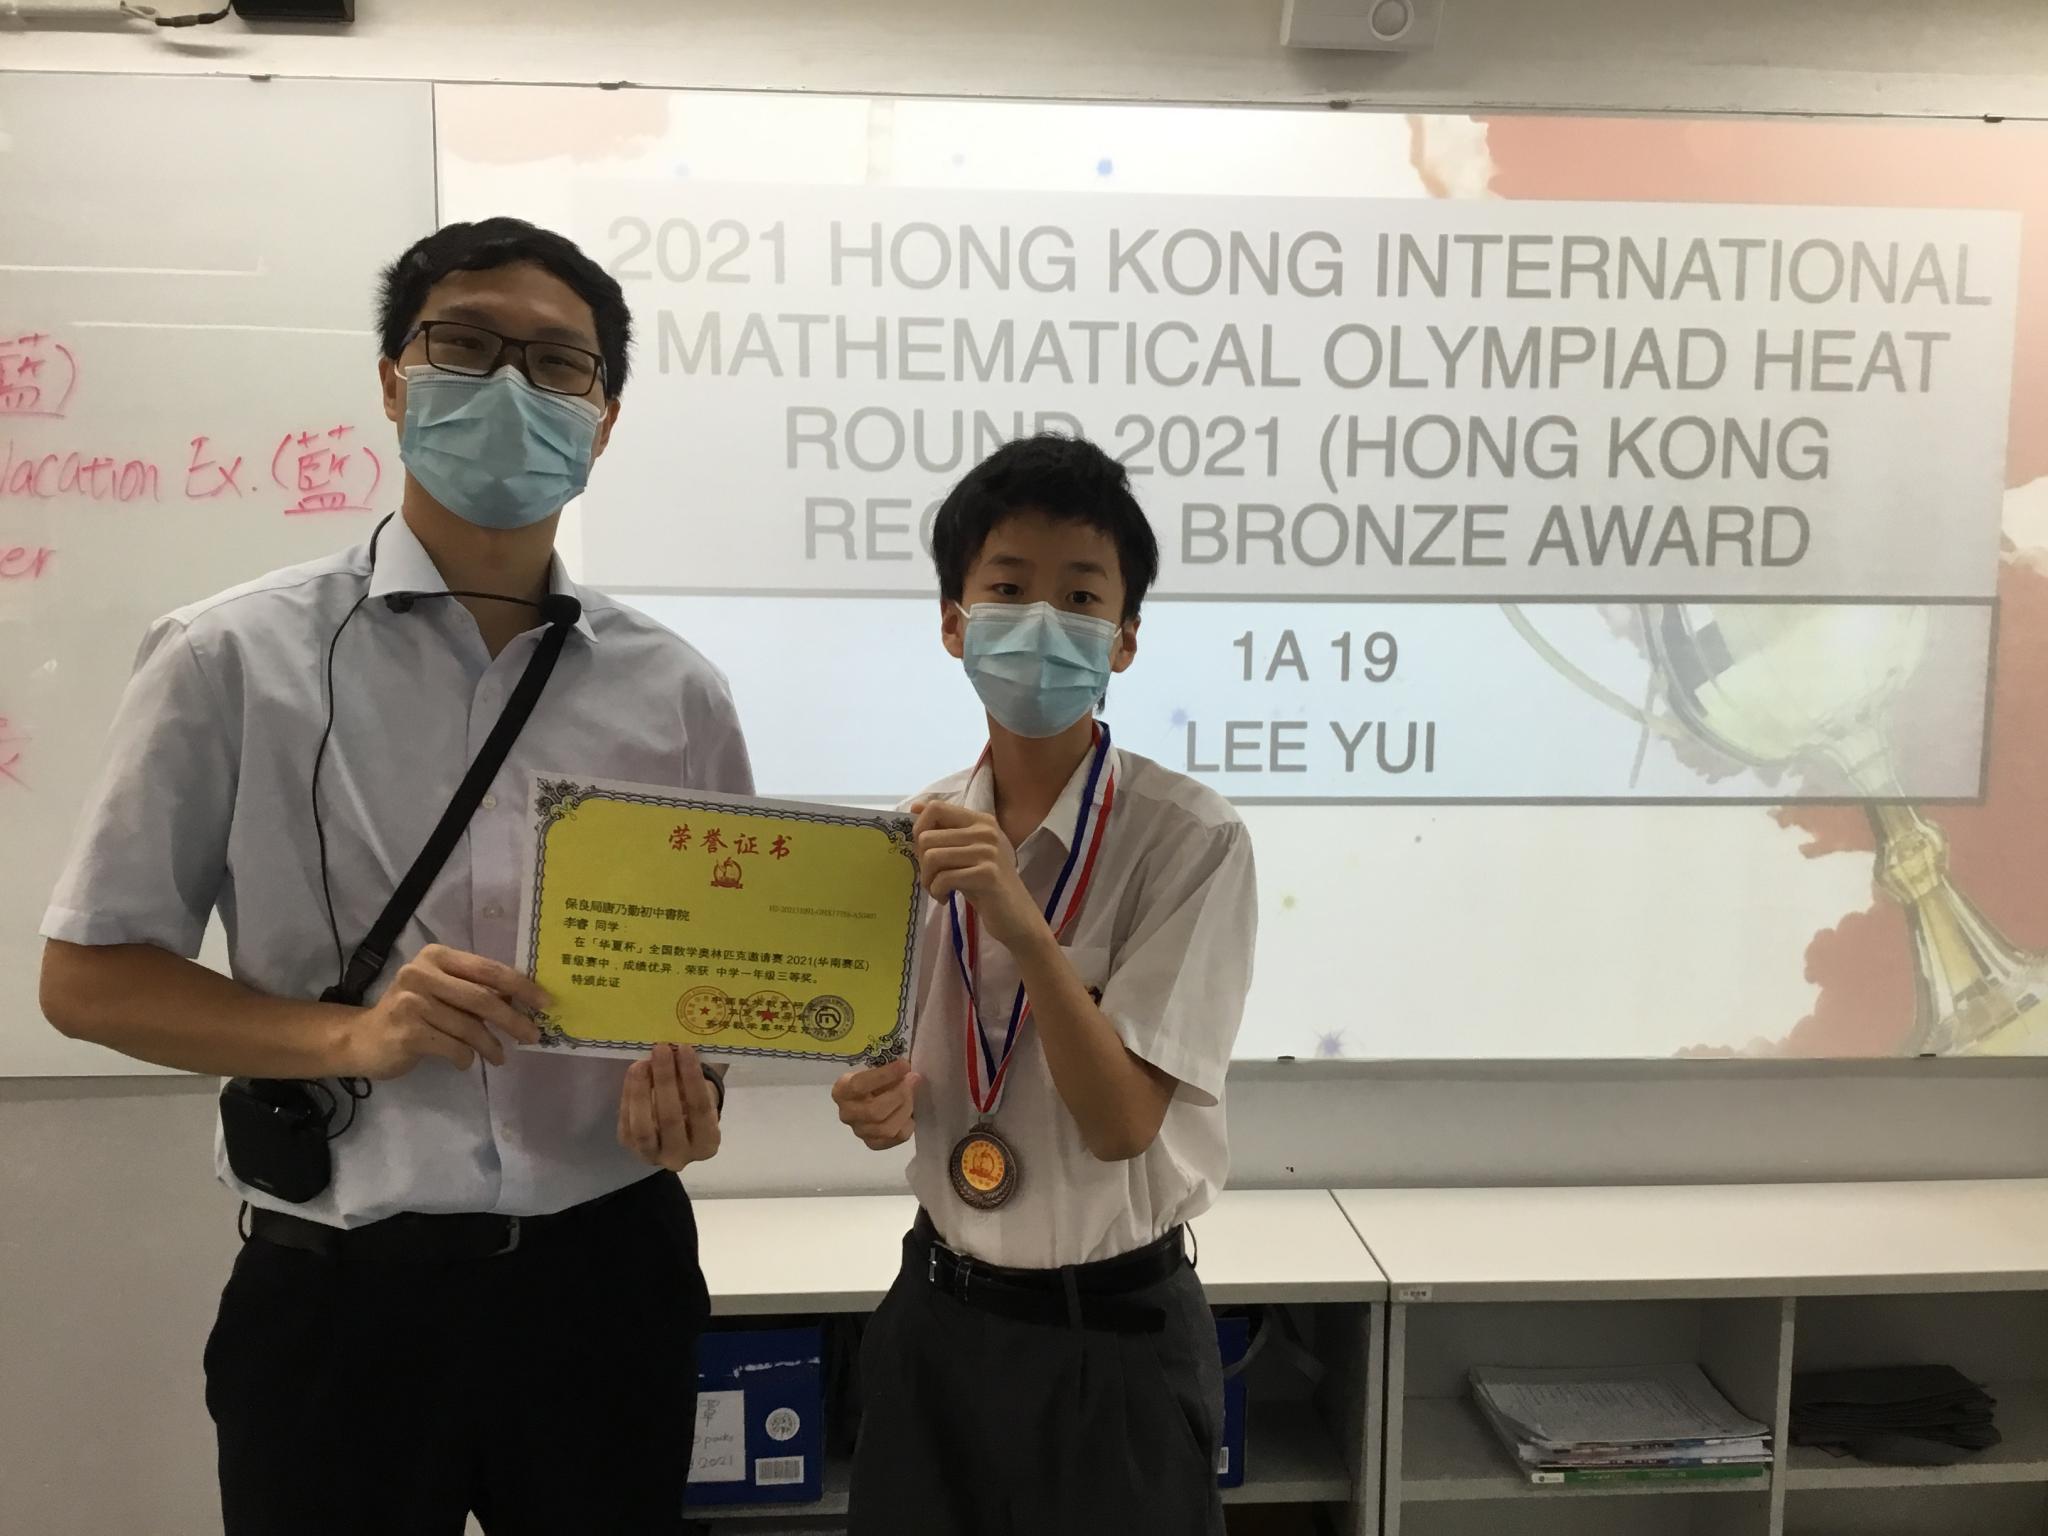 2021 Hong Kong International Mathematical Olympiad Heat Round 2021 (Hong Kong Region) - 1A LEE Yui (Bronze Award)